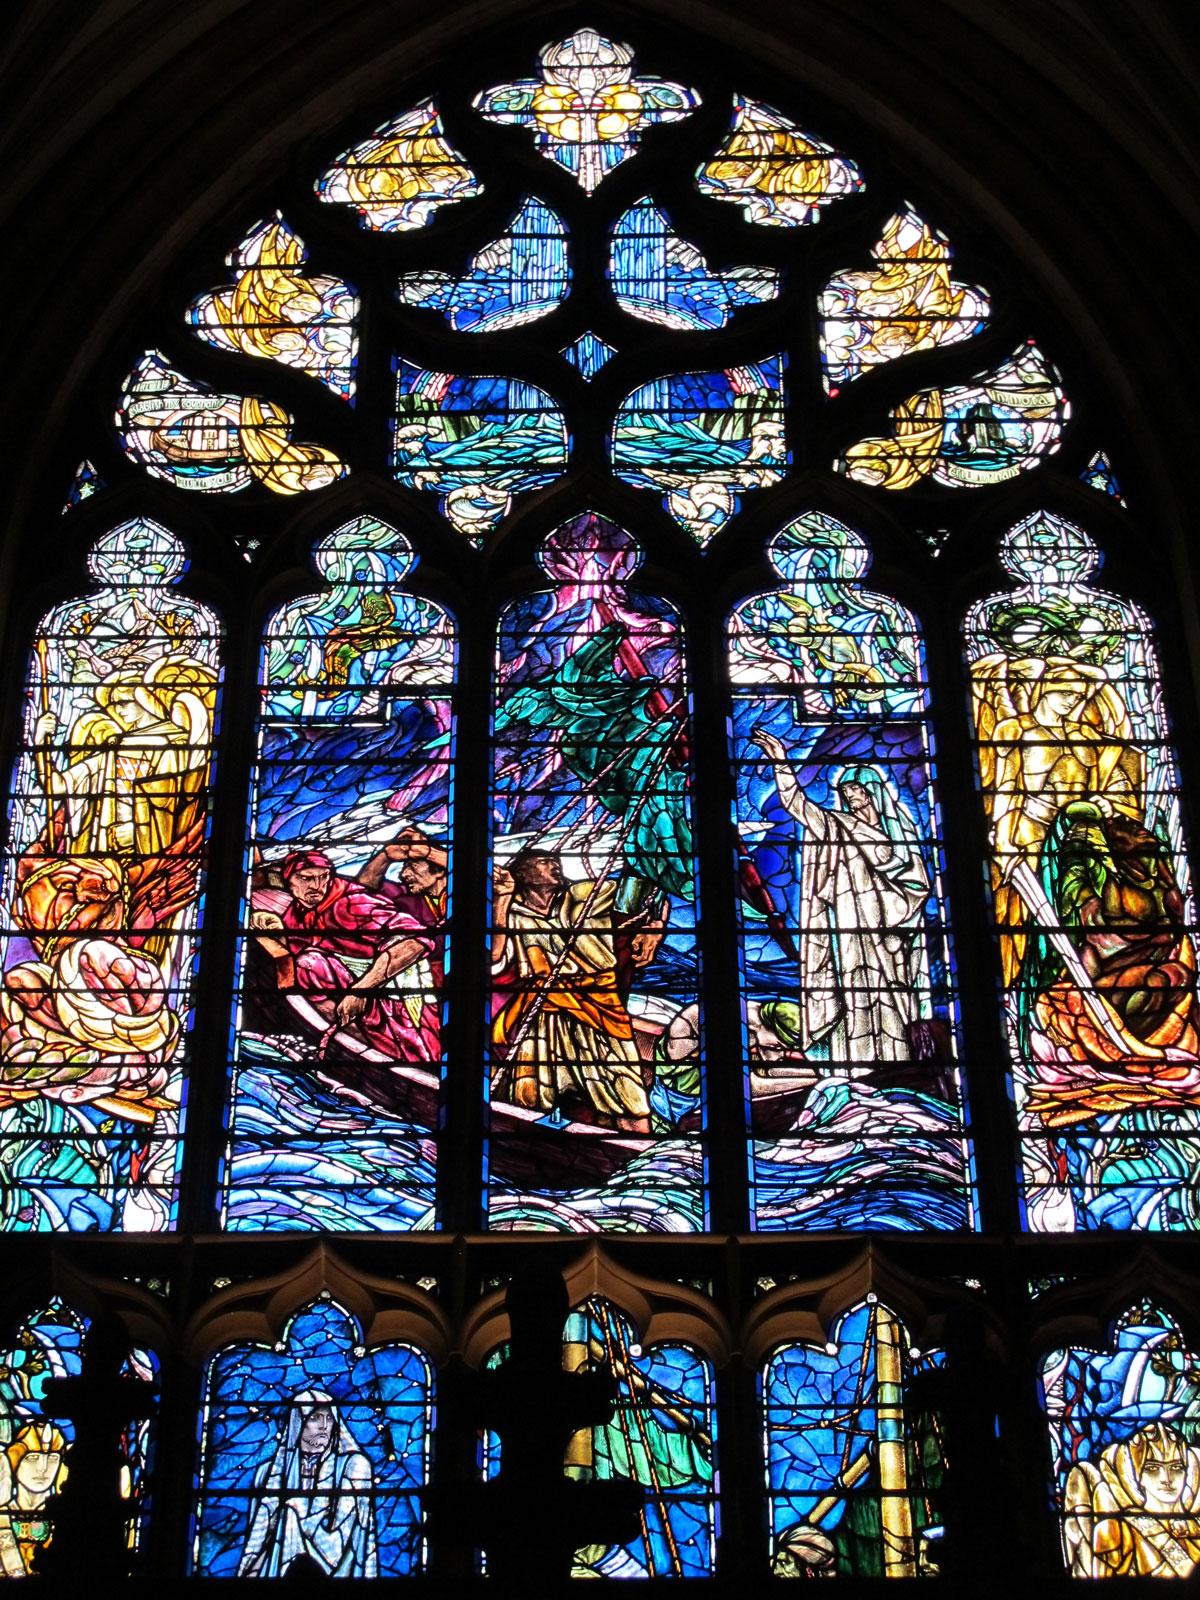 The North Window